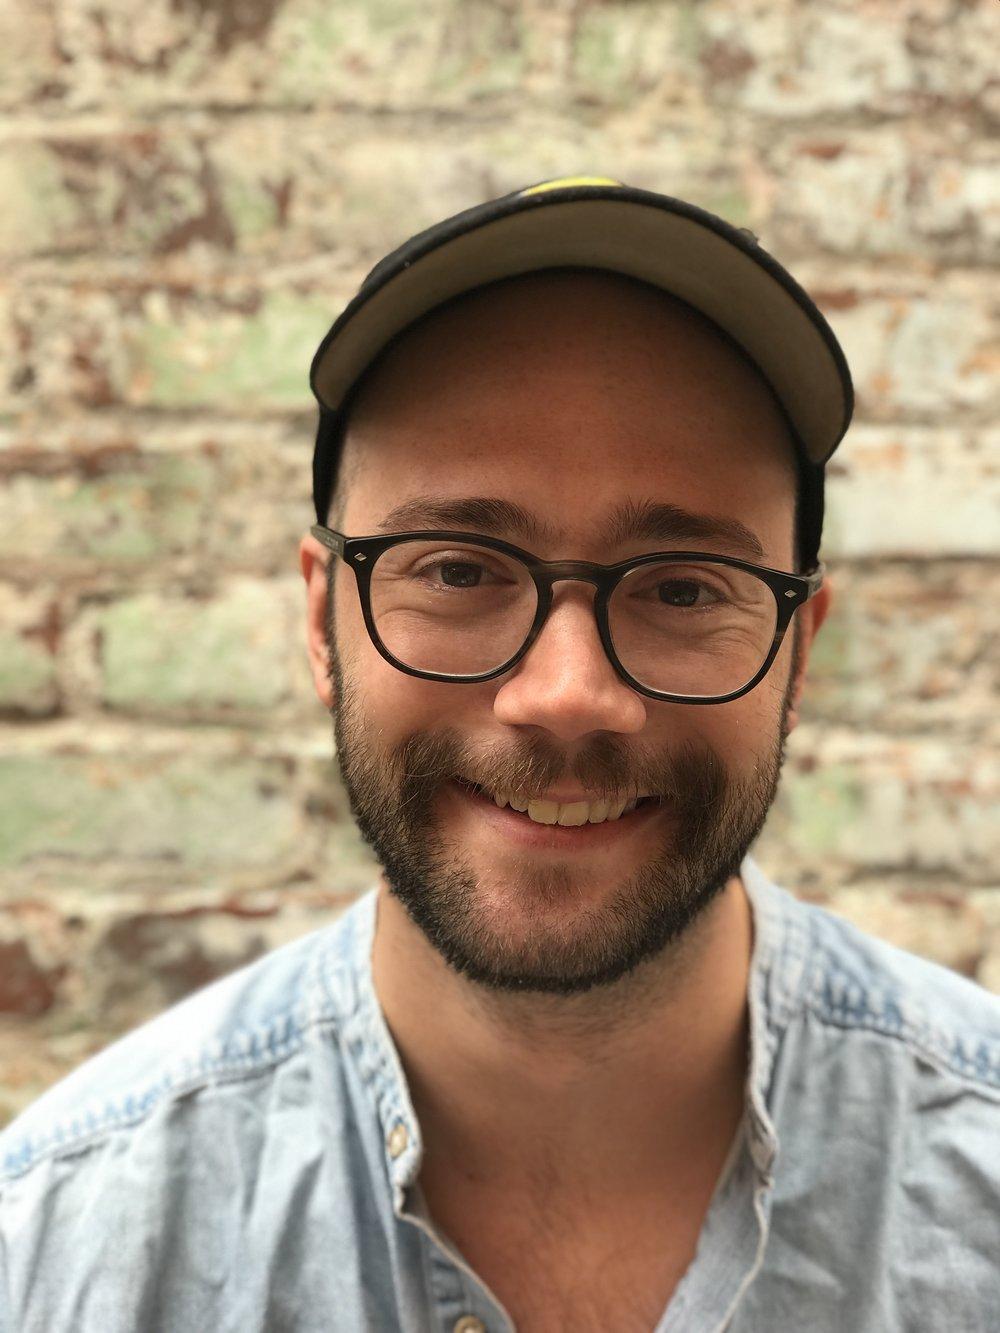 Ryan Eakins | Director, Writer, Editor, Producer